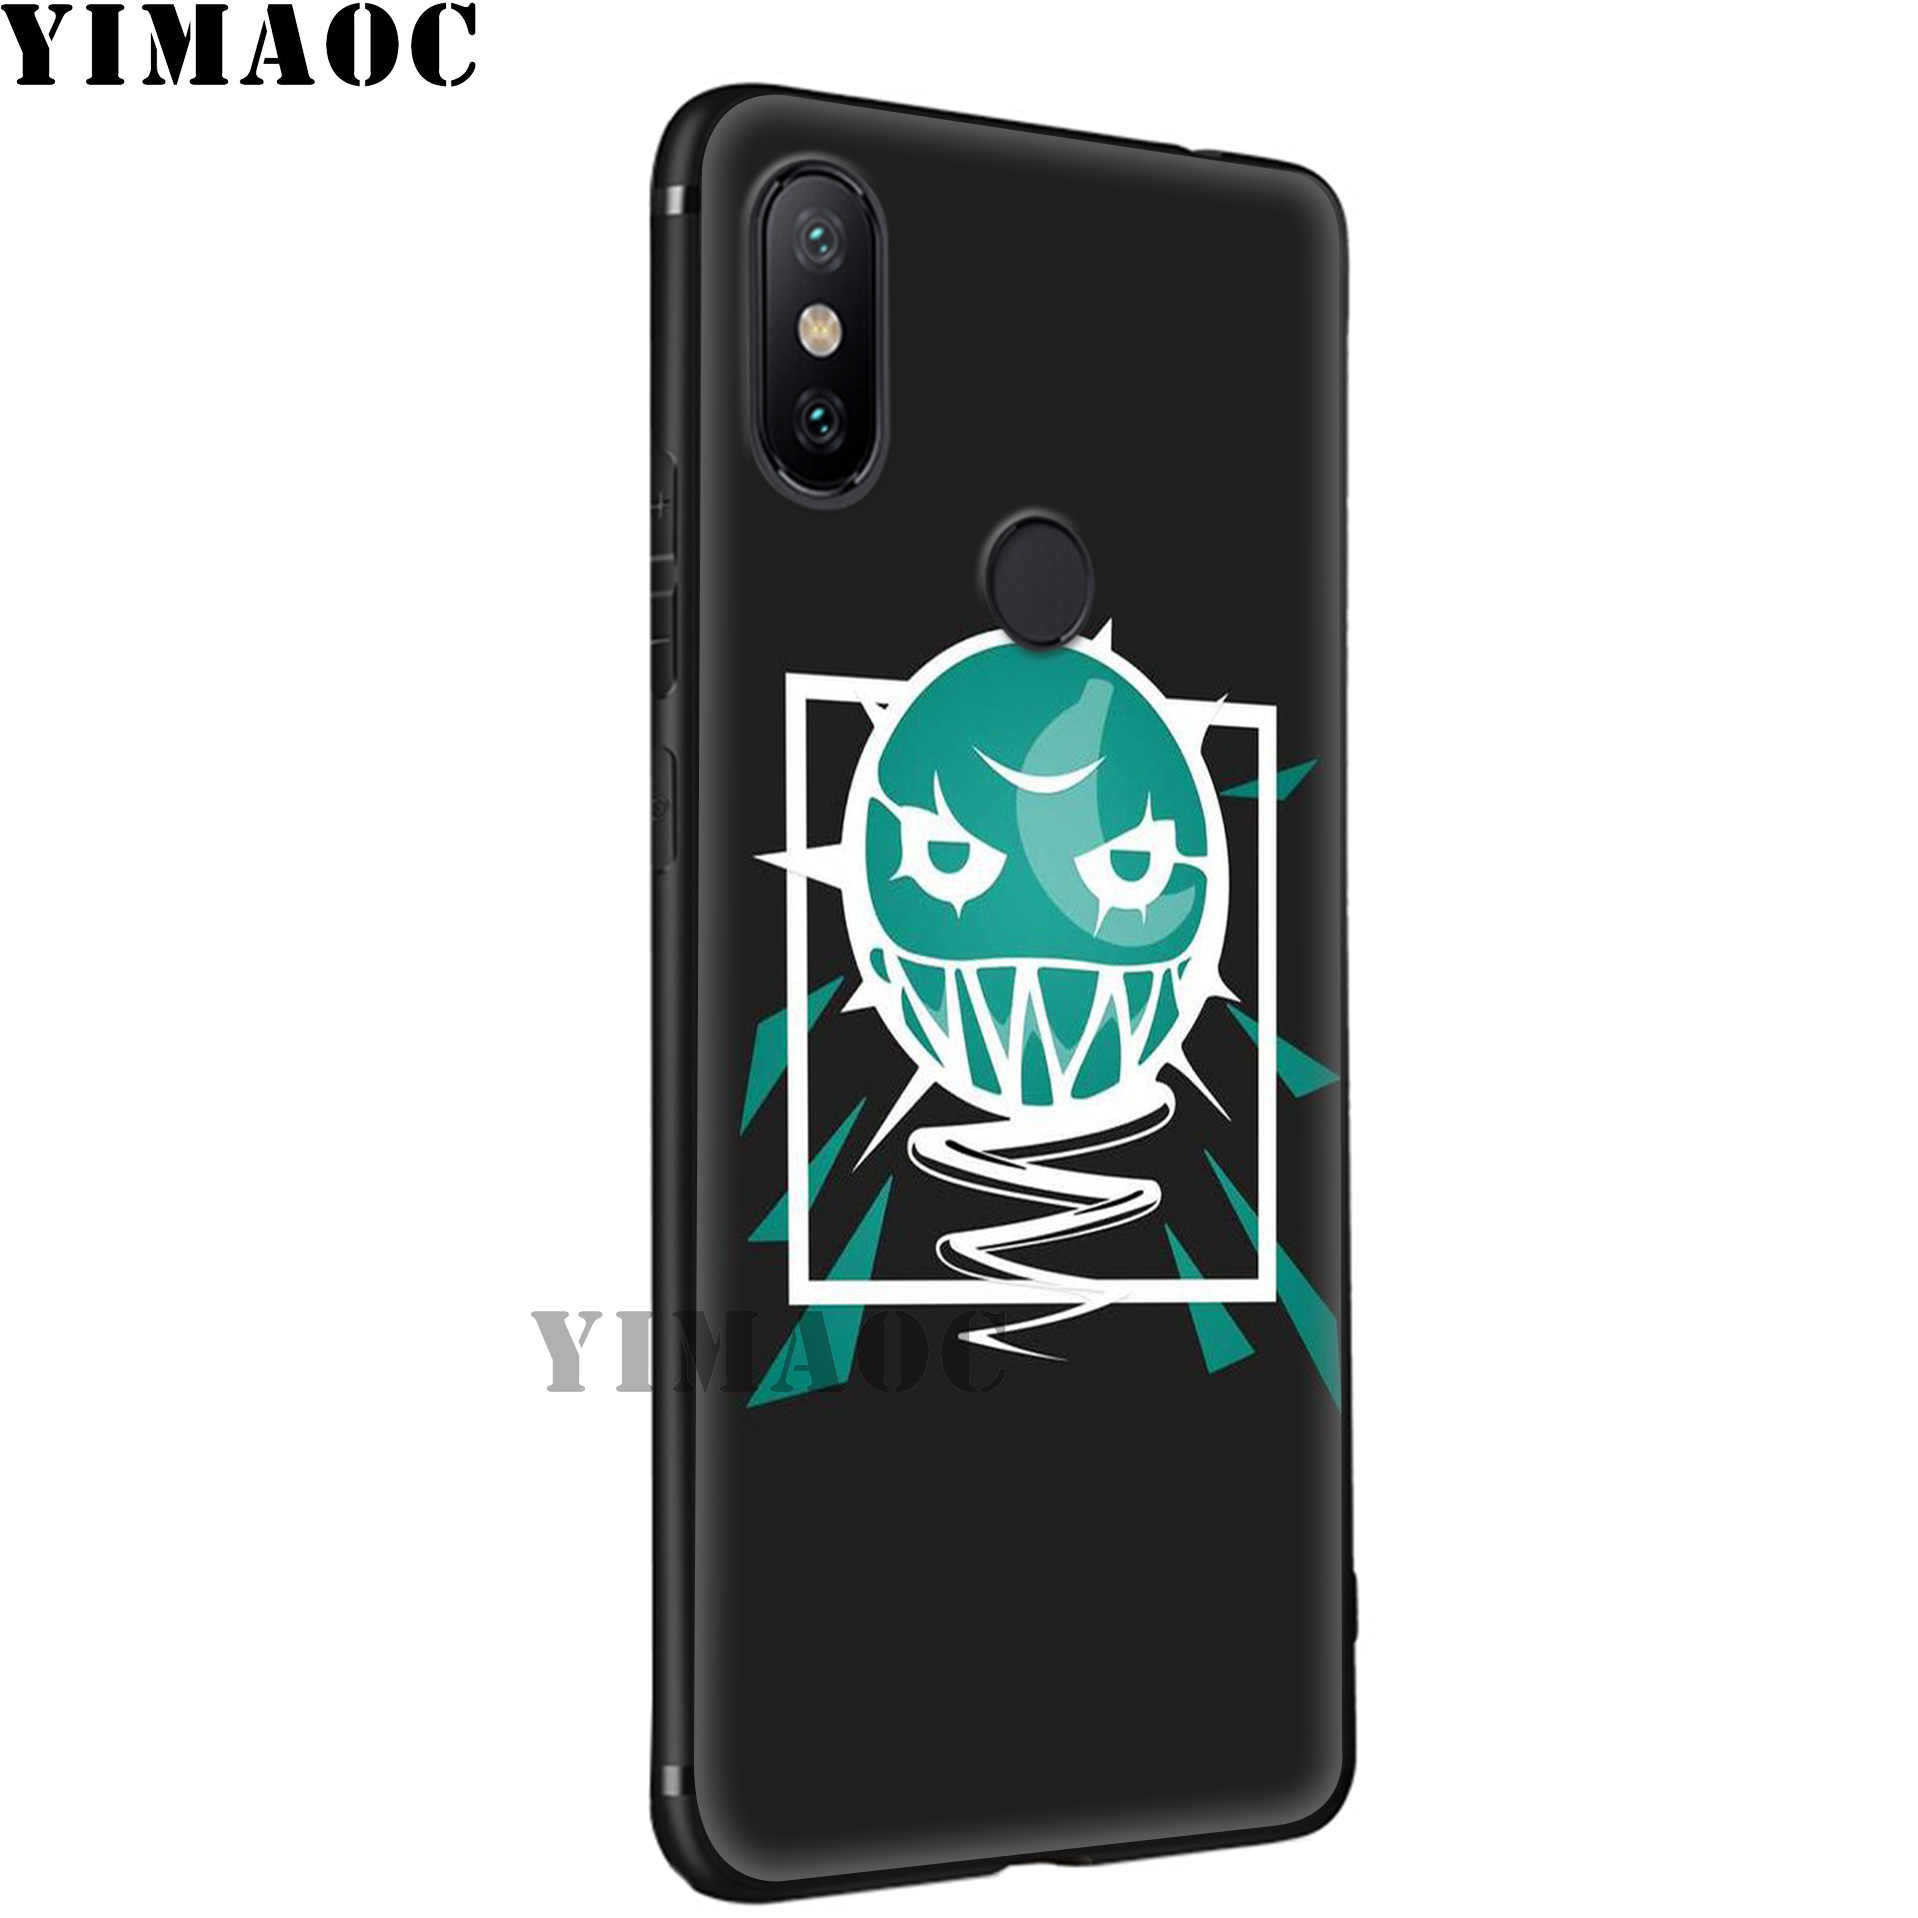 Yimaoc Rainbow 6 Siege Permainan Lembut Case untuk Xiao Mi Mi 9T 9 8 Se 6 Max 3 A1 a2 Lite Mi A1 Mi A2 CC9E CC9 6X 5X Pocophone F1